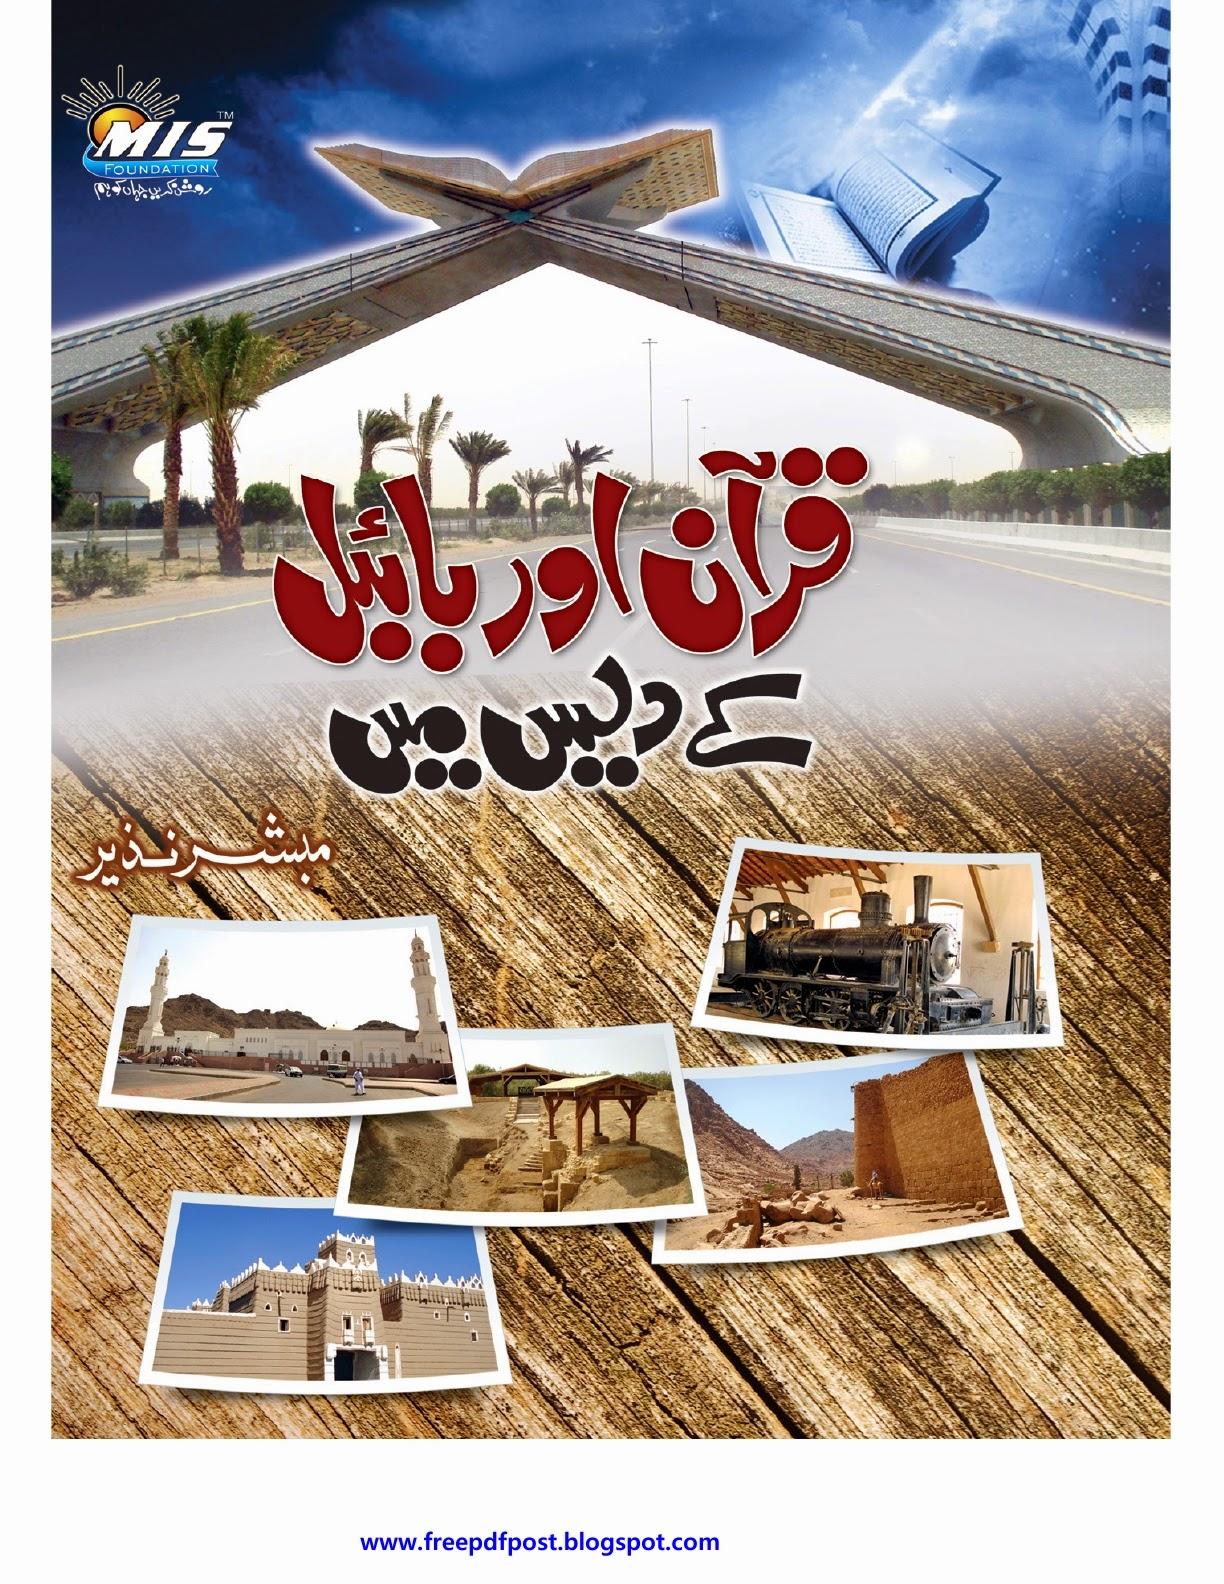 http://www.mediafire.com/view/ofxkkaakitadjjw/L0014-Safarnama_Arab-(freepdfpost.blogspot.com).pdf